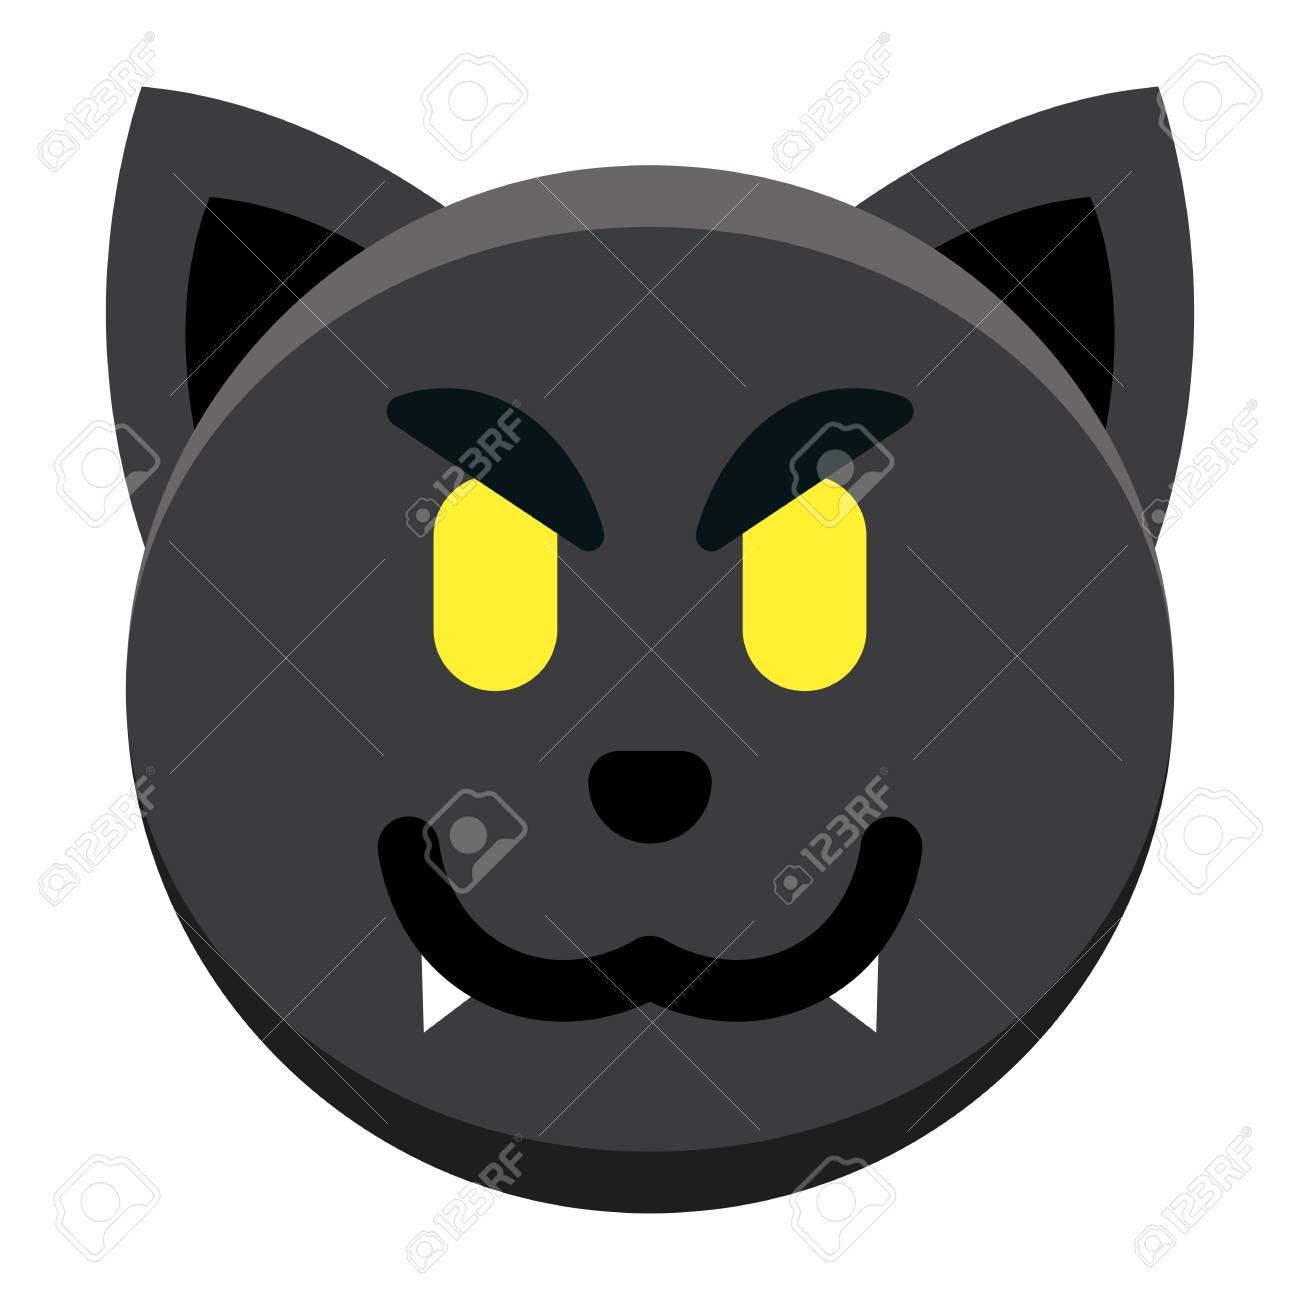 Funny Emoji Black Background